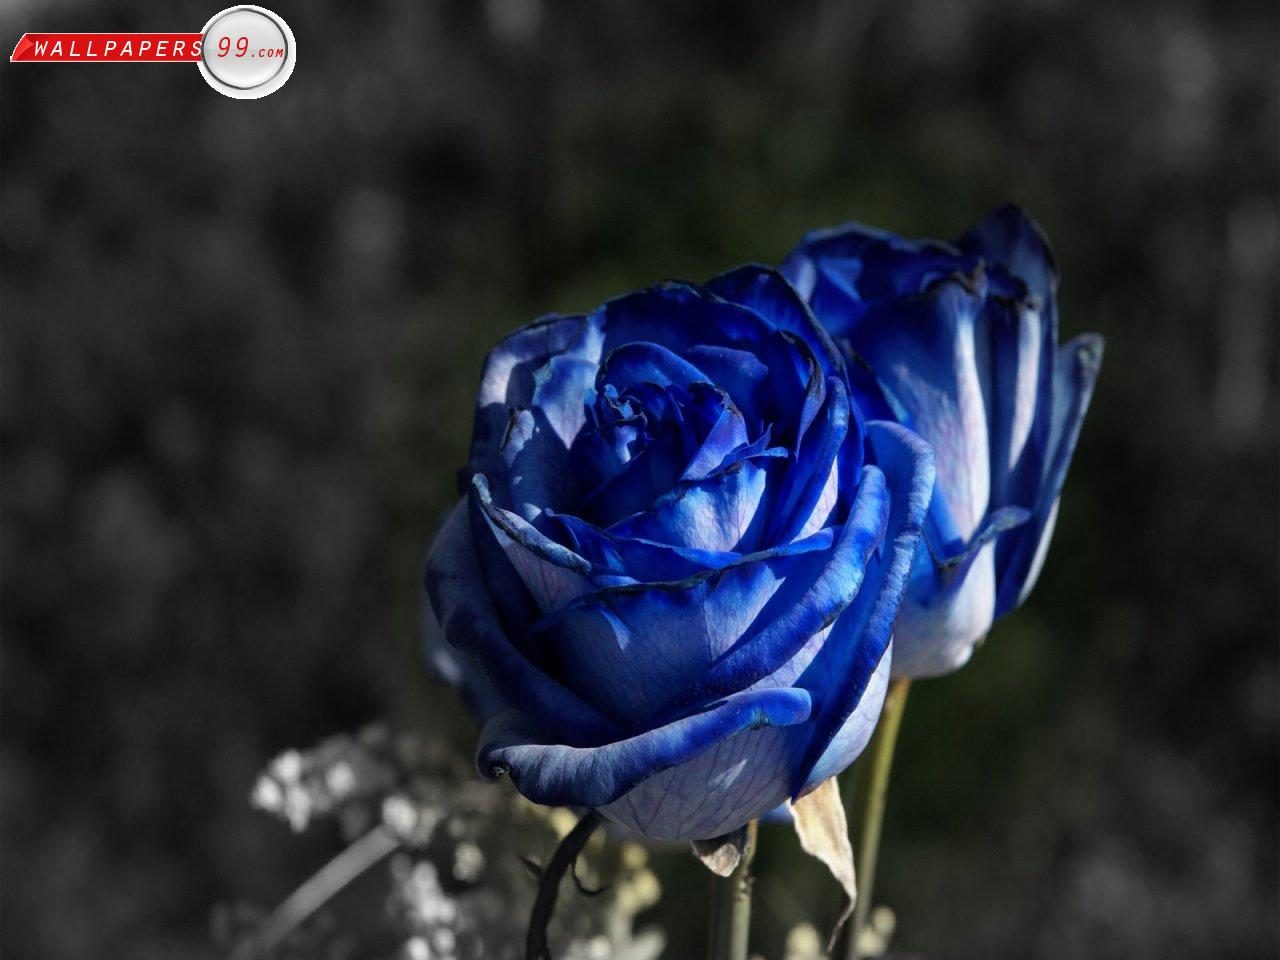 Rose wallpaper blue rose hd wallpaper free download - Blue rose hd wallpaper download ...